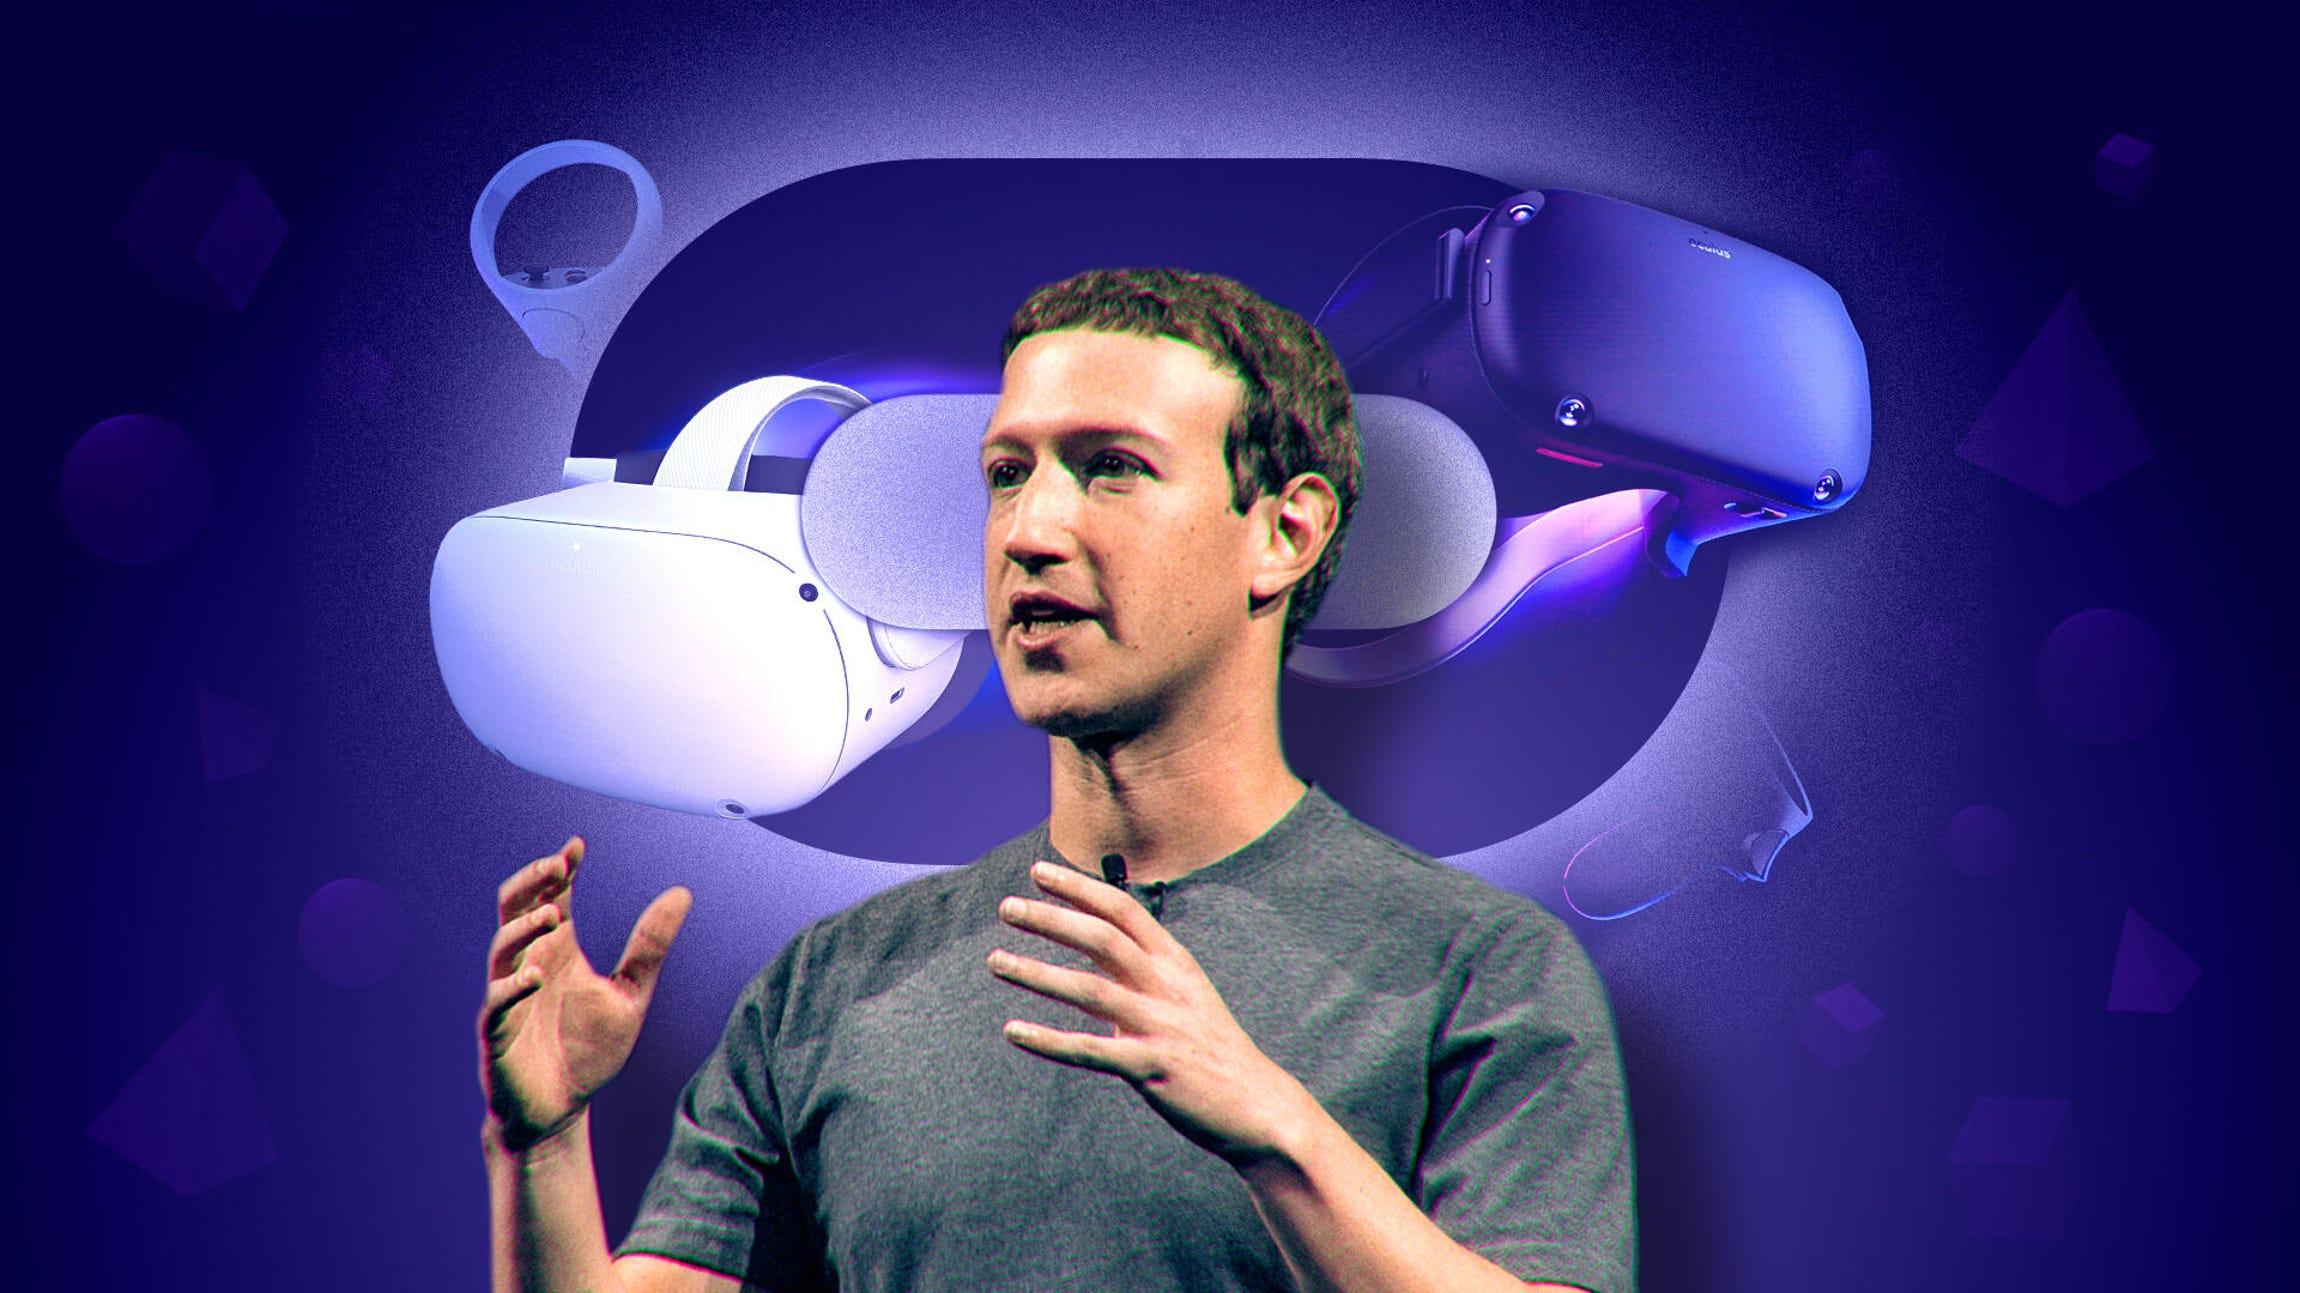 Mark Zuckerberg Oculus Quest VR headsets